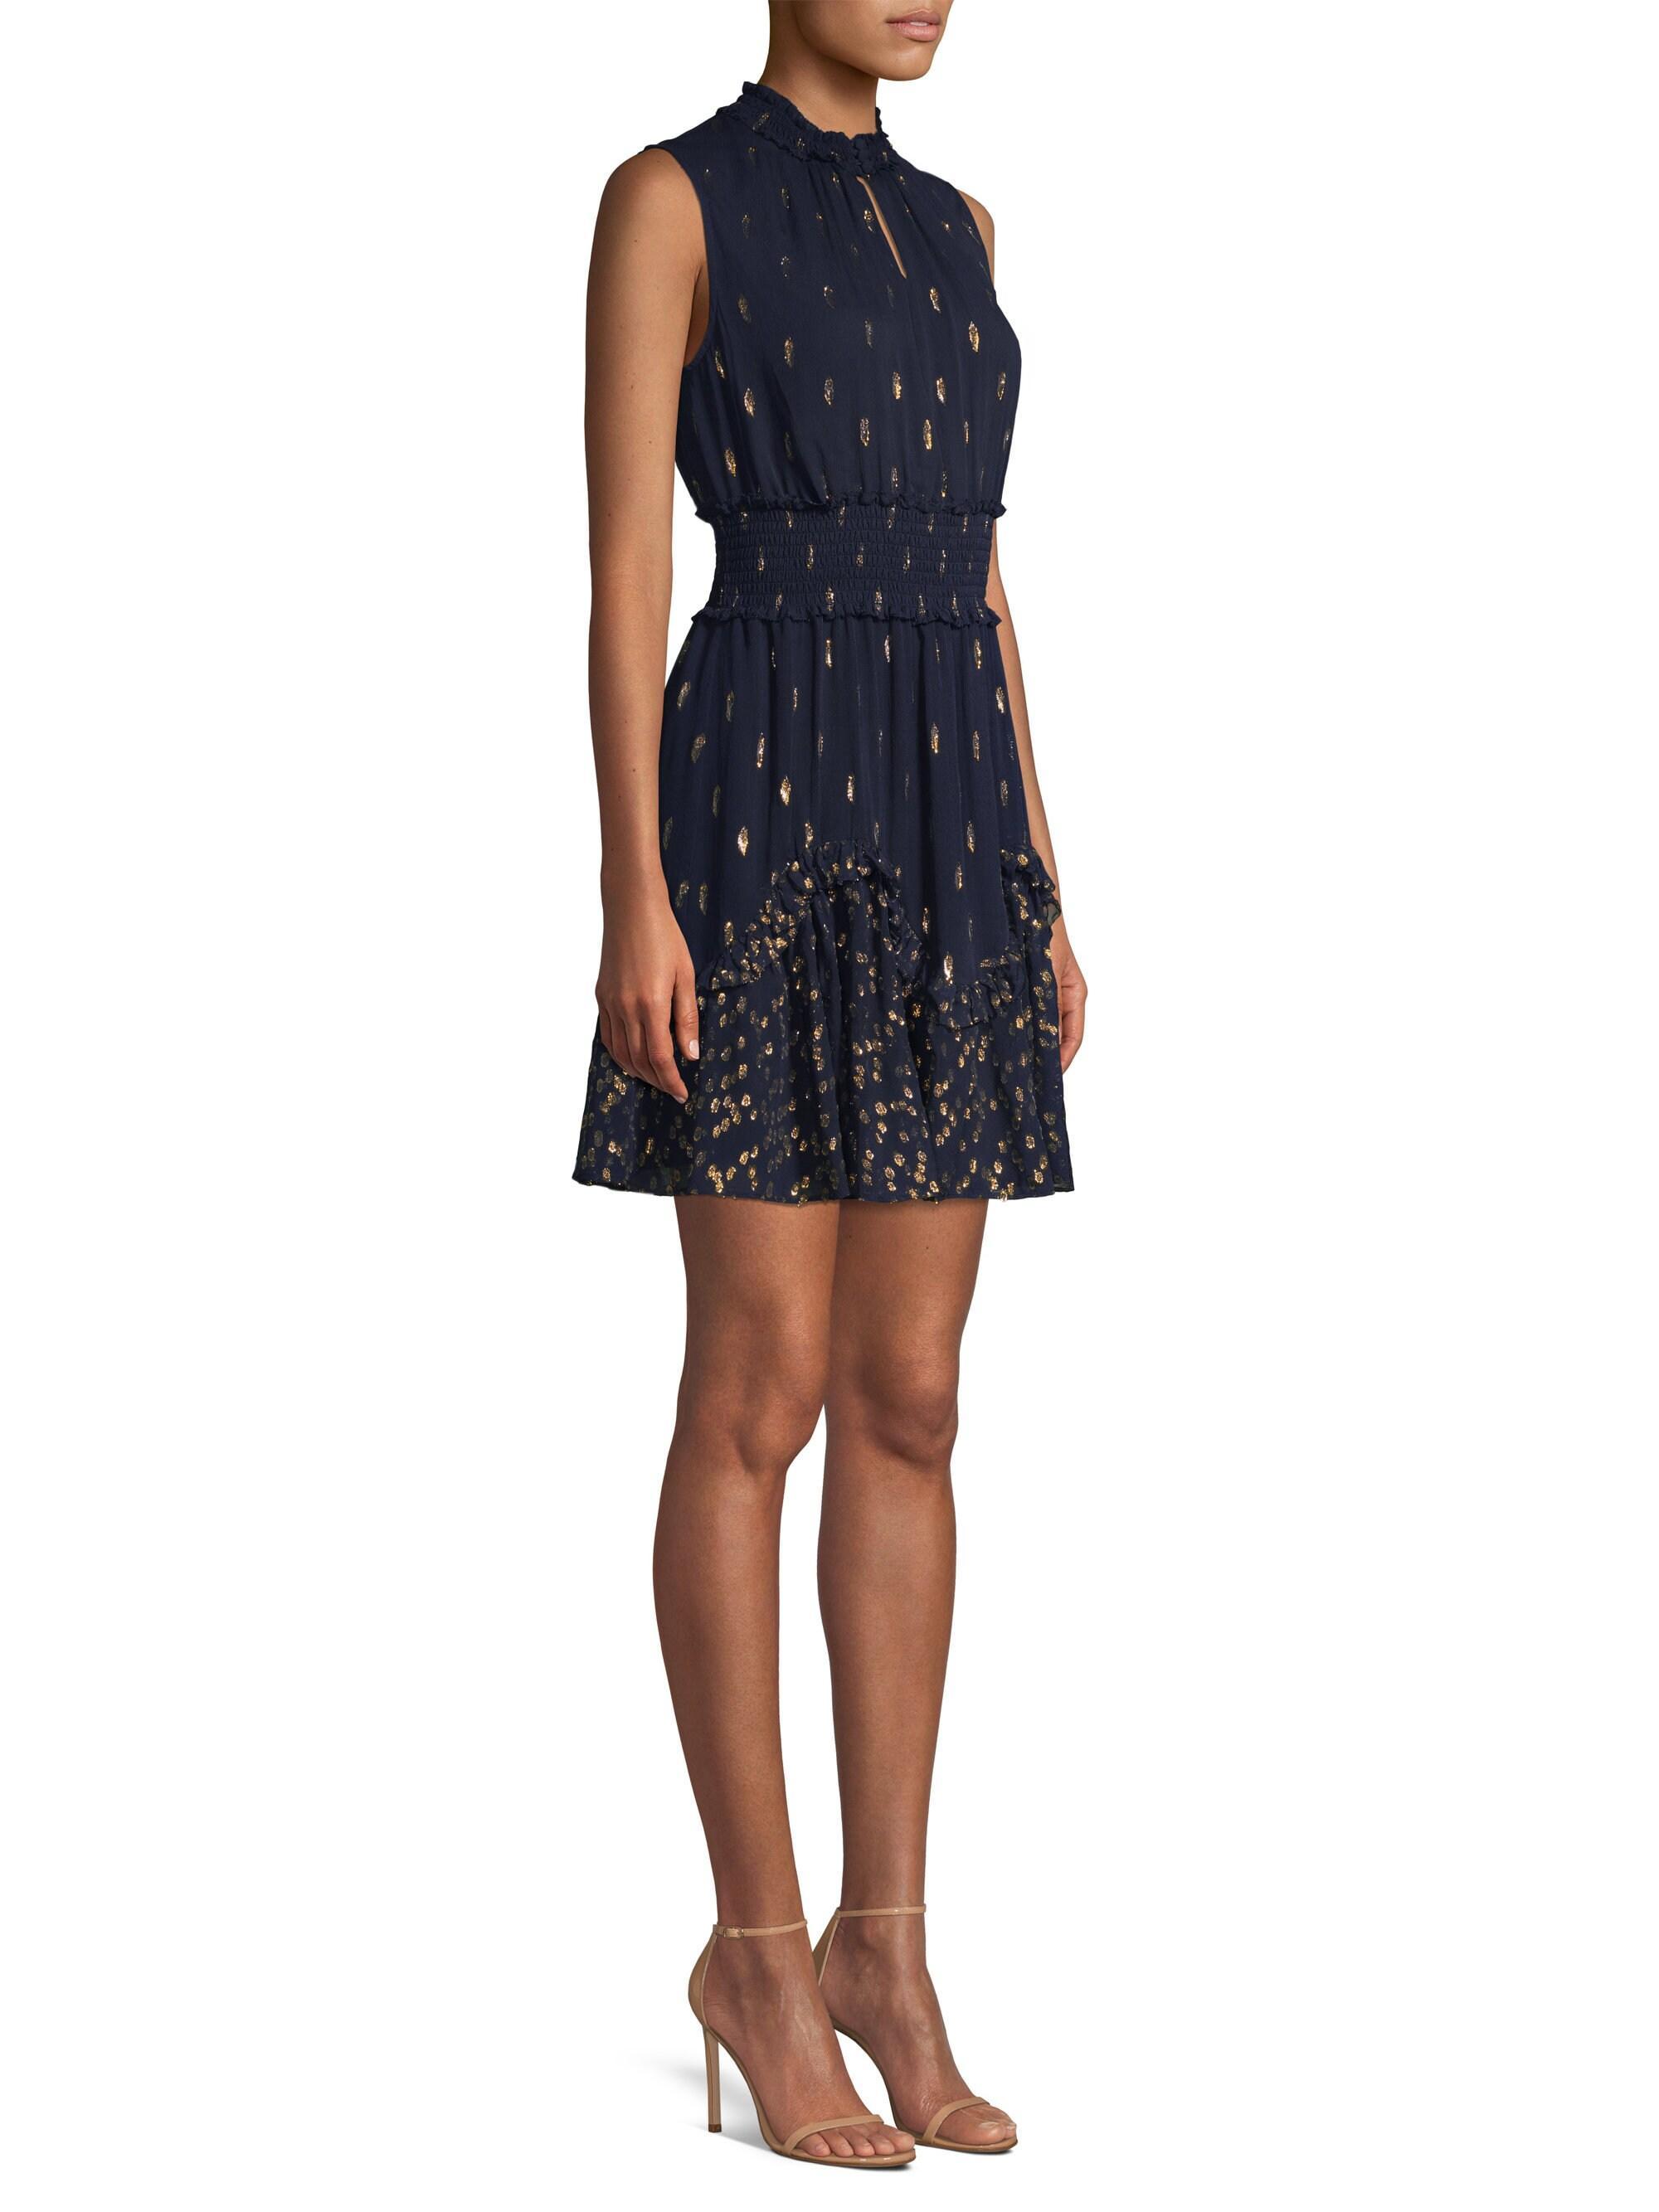 b7e7bdf1592 Rebecca Taylor Polka Dot Ruffle Dress in Blue - Lyst